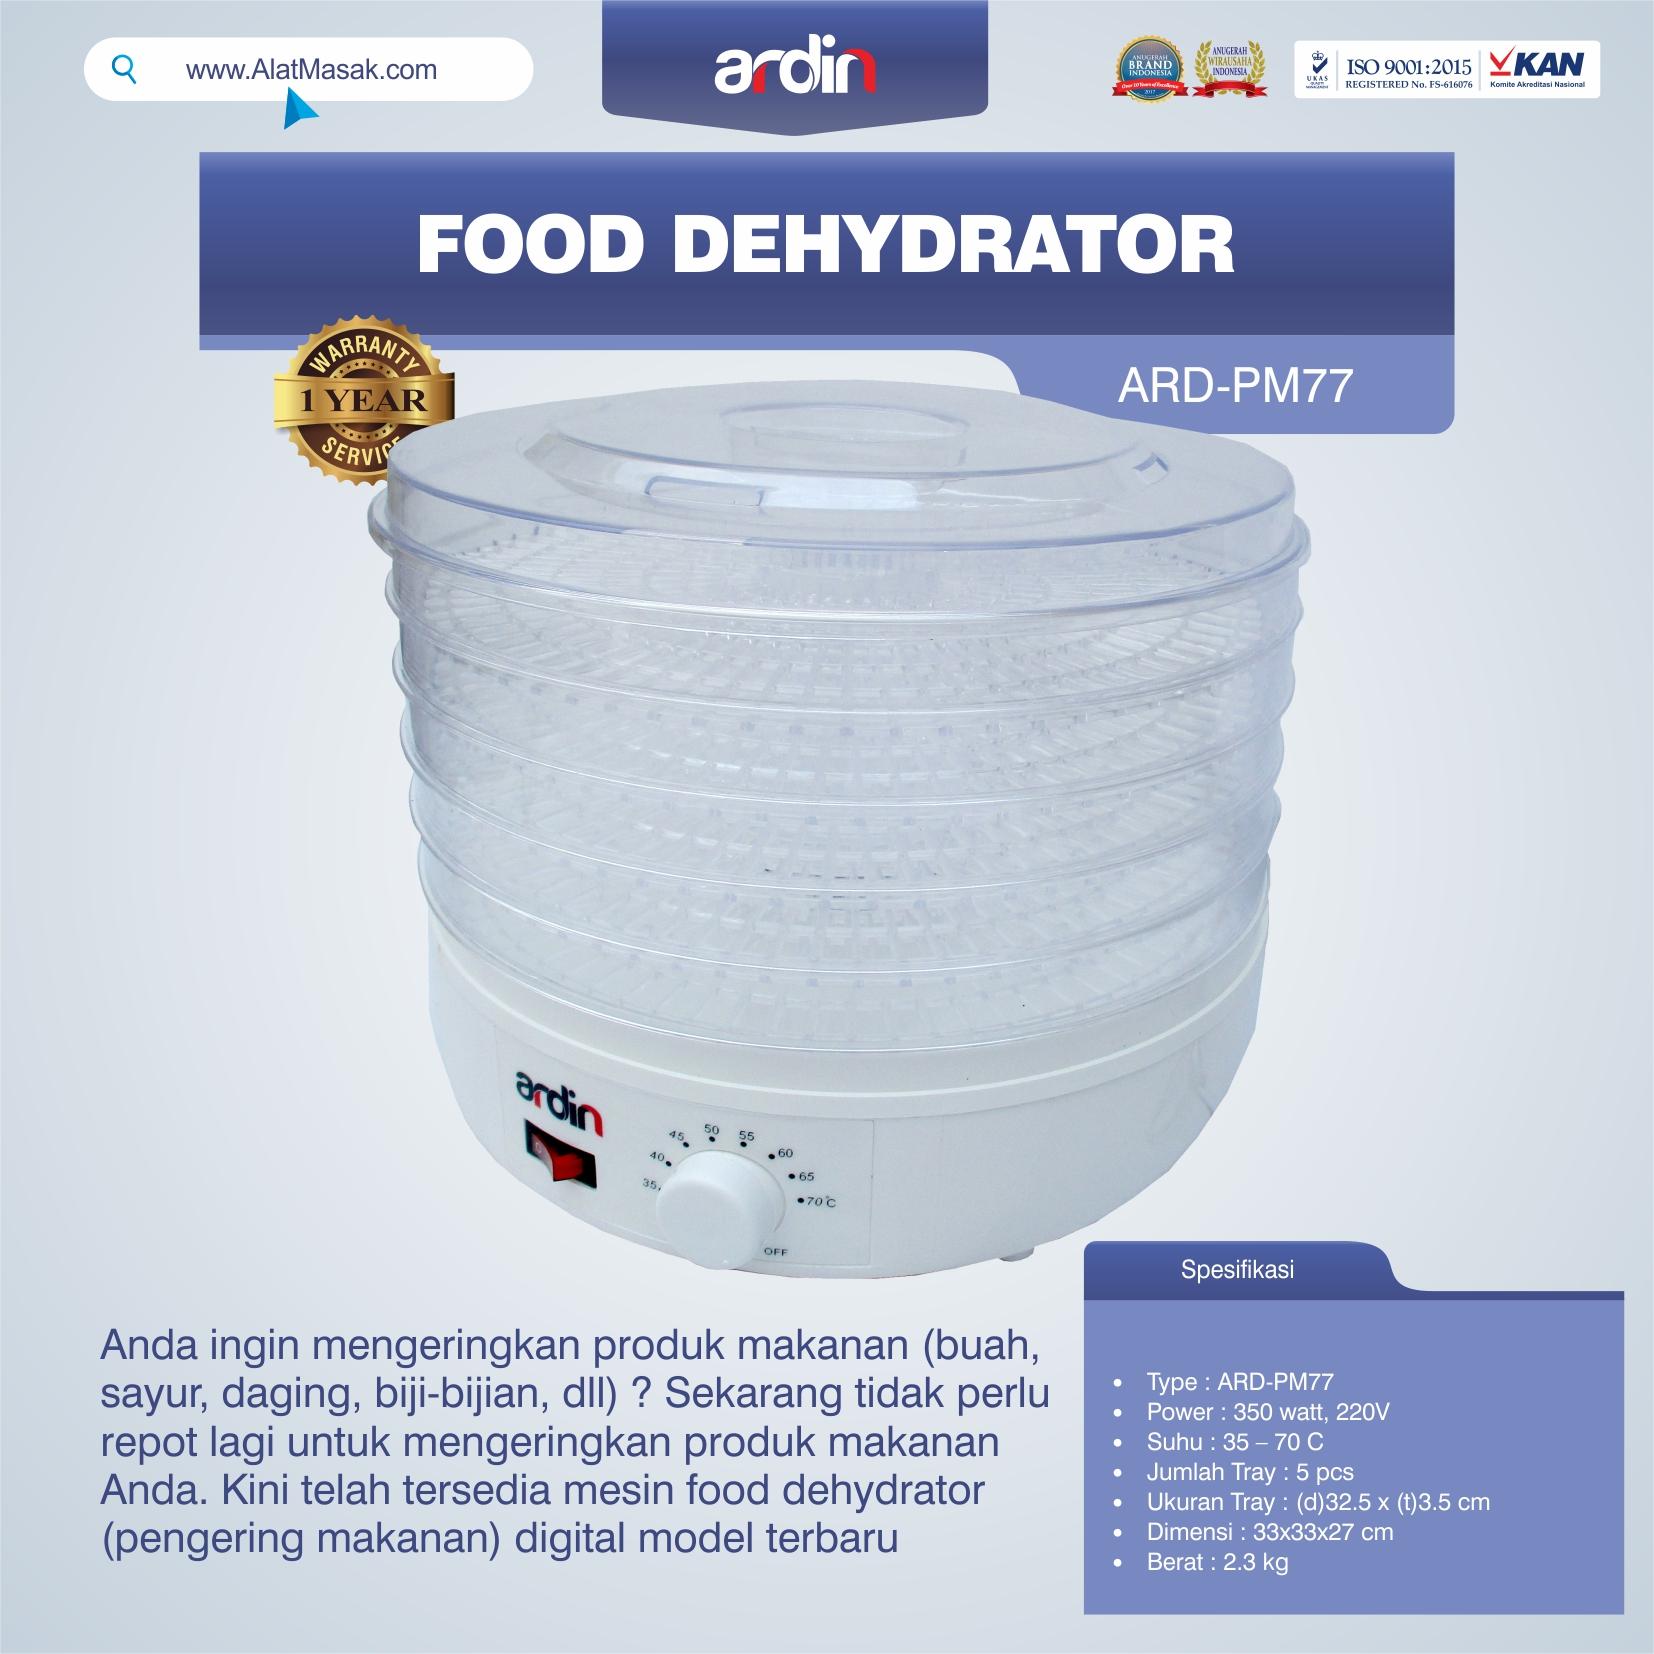 Food Dehydrator ARD-PM77